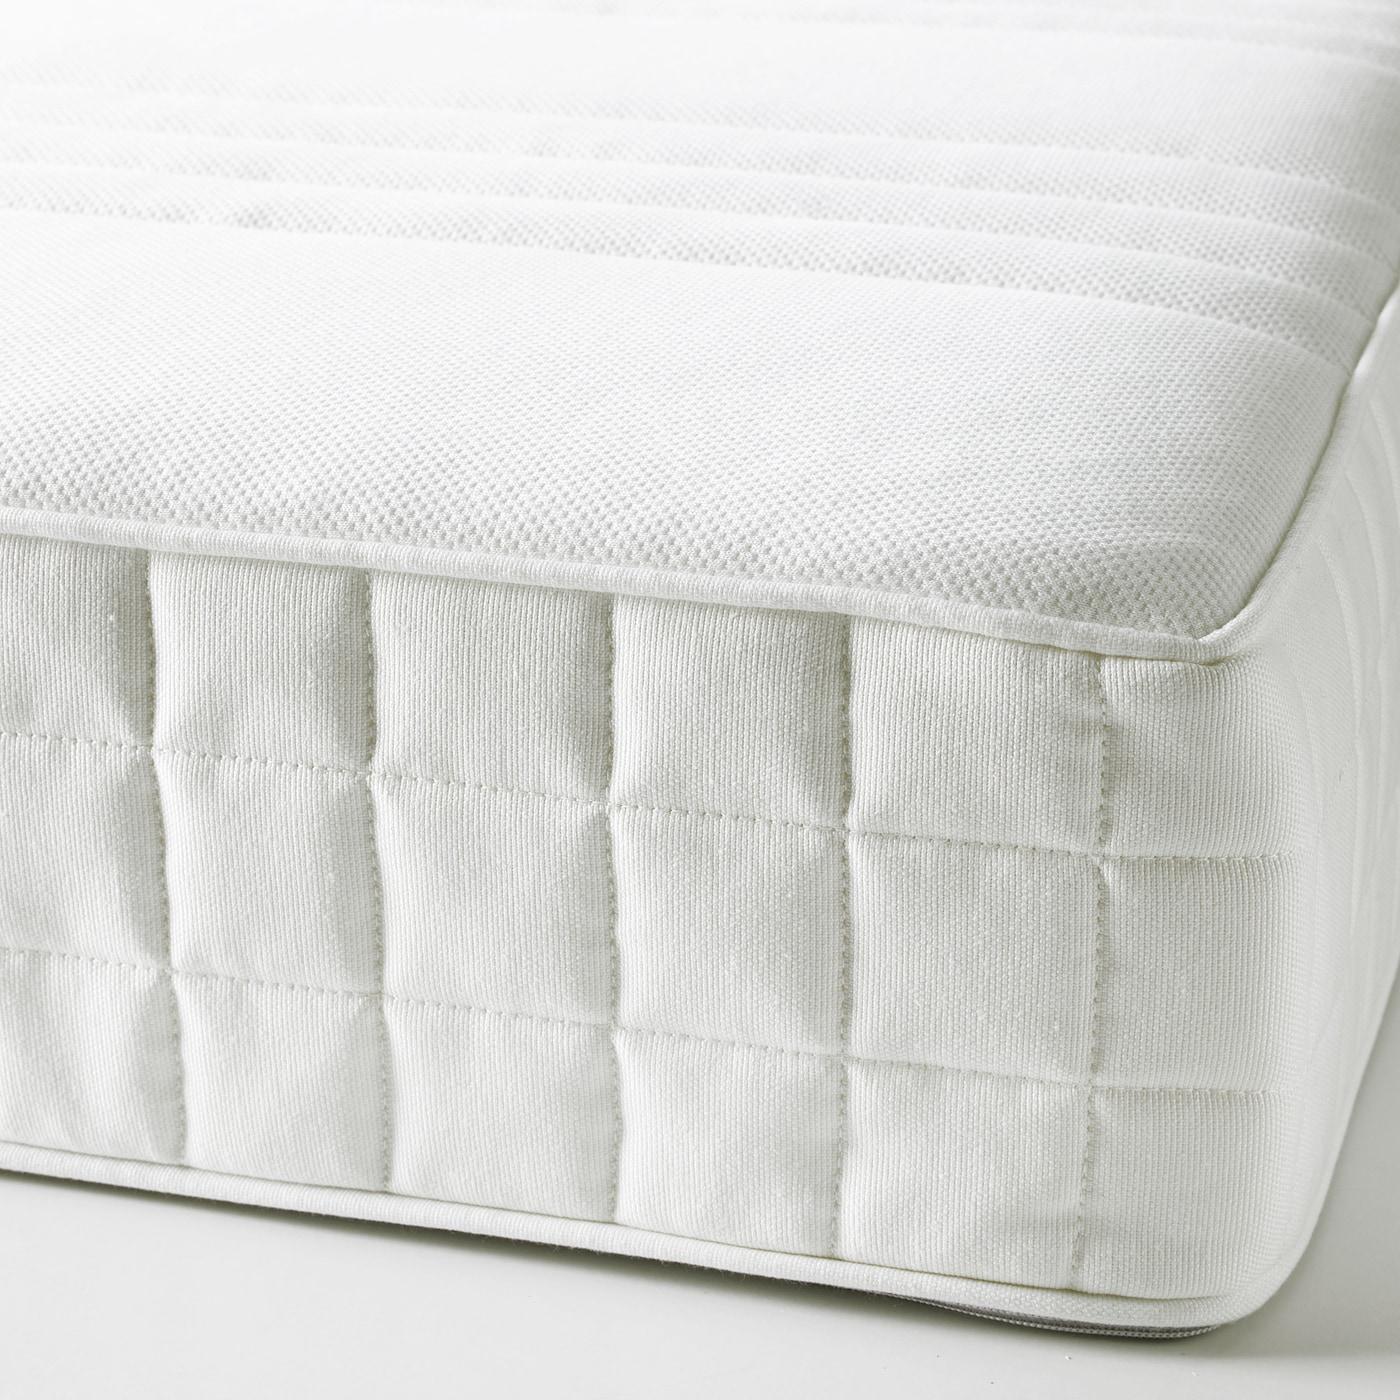 Matrand Materasso In Memory Foam Rigido Bianco 160x190 Cm Ikea It